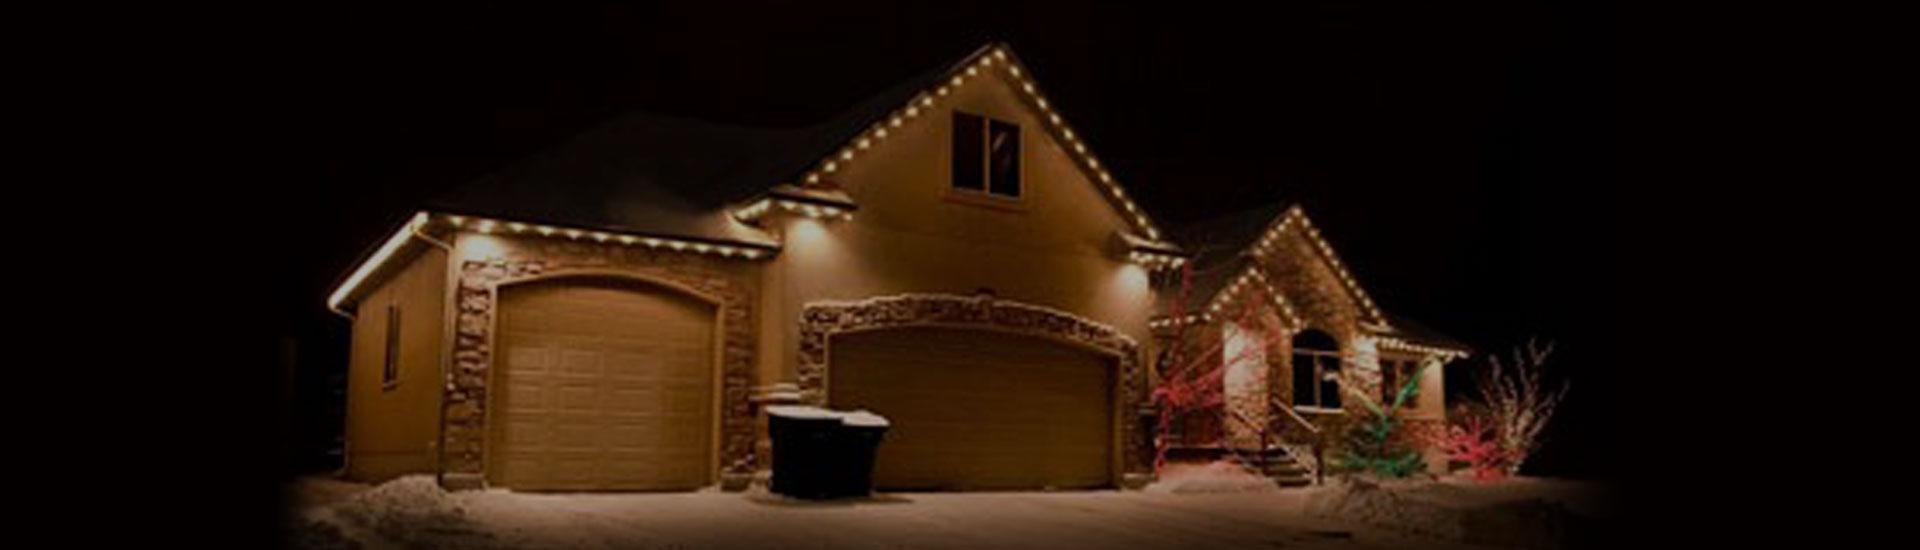 Calgary Christmas Light Installation | Your Tree Doctor